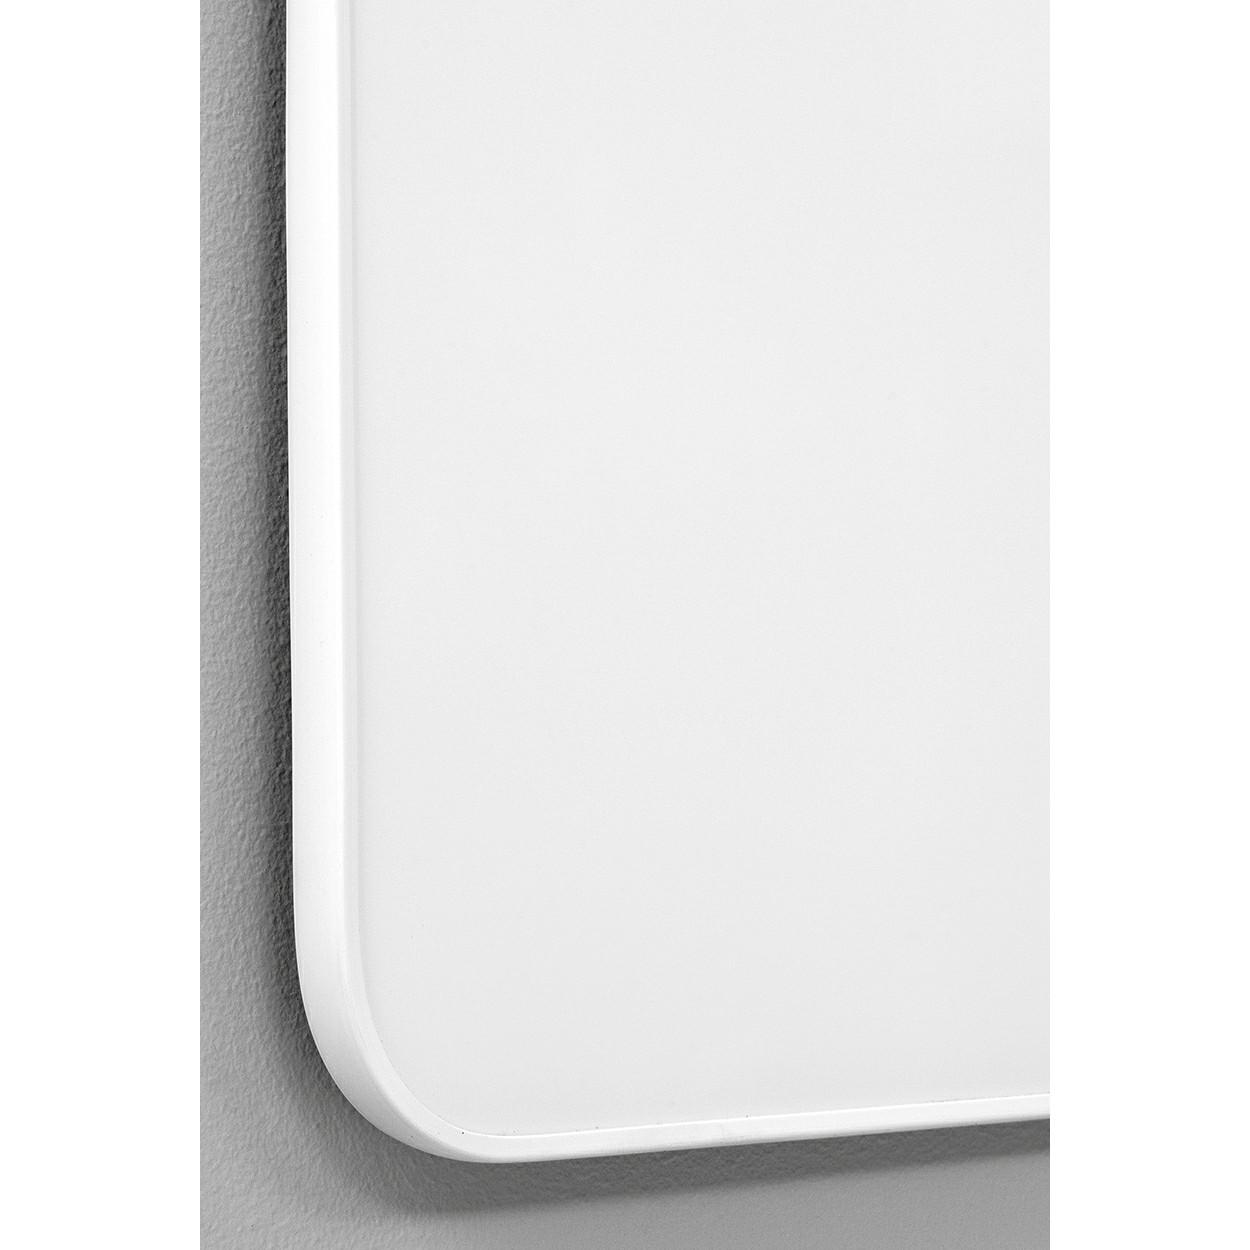 Whiteboard Lintex Edge - med hvid ramme 250 x 120 cm